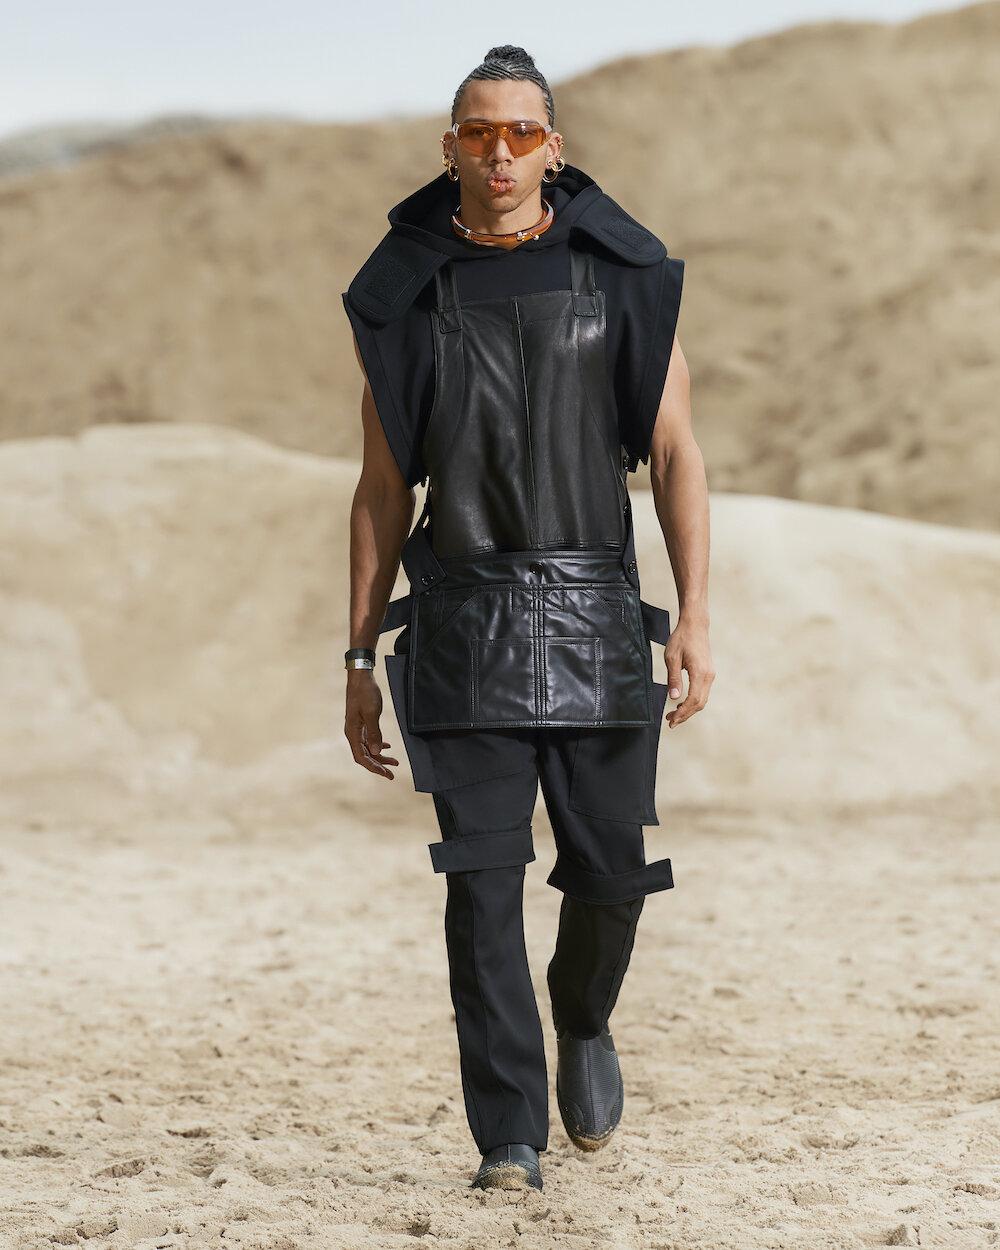 Burberry Spring_Summer 2022 Menswear Presentation Collection - Look 15 - Niclas.jpg